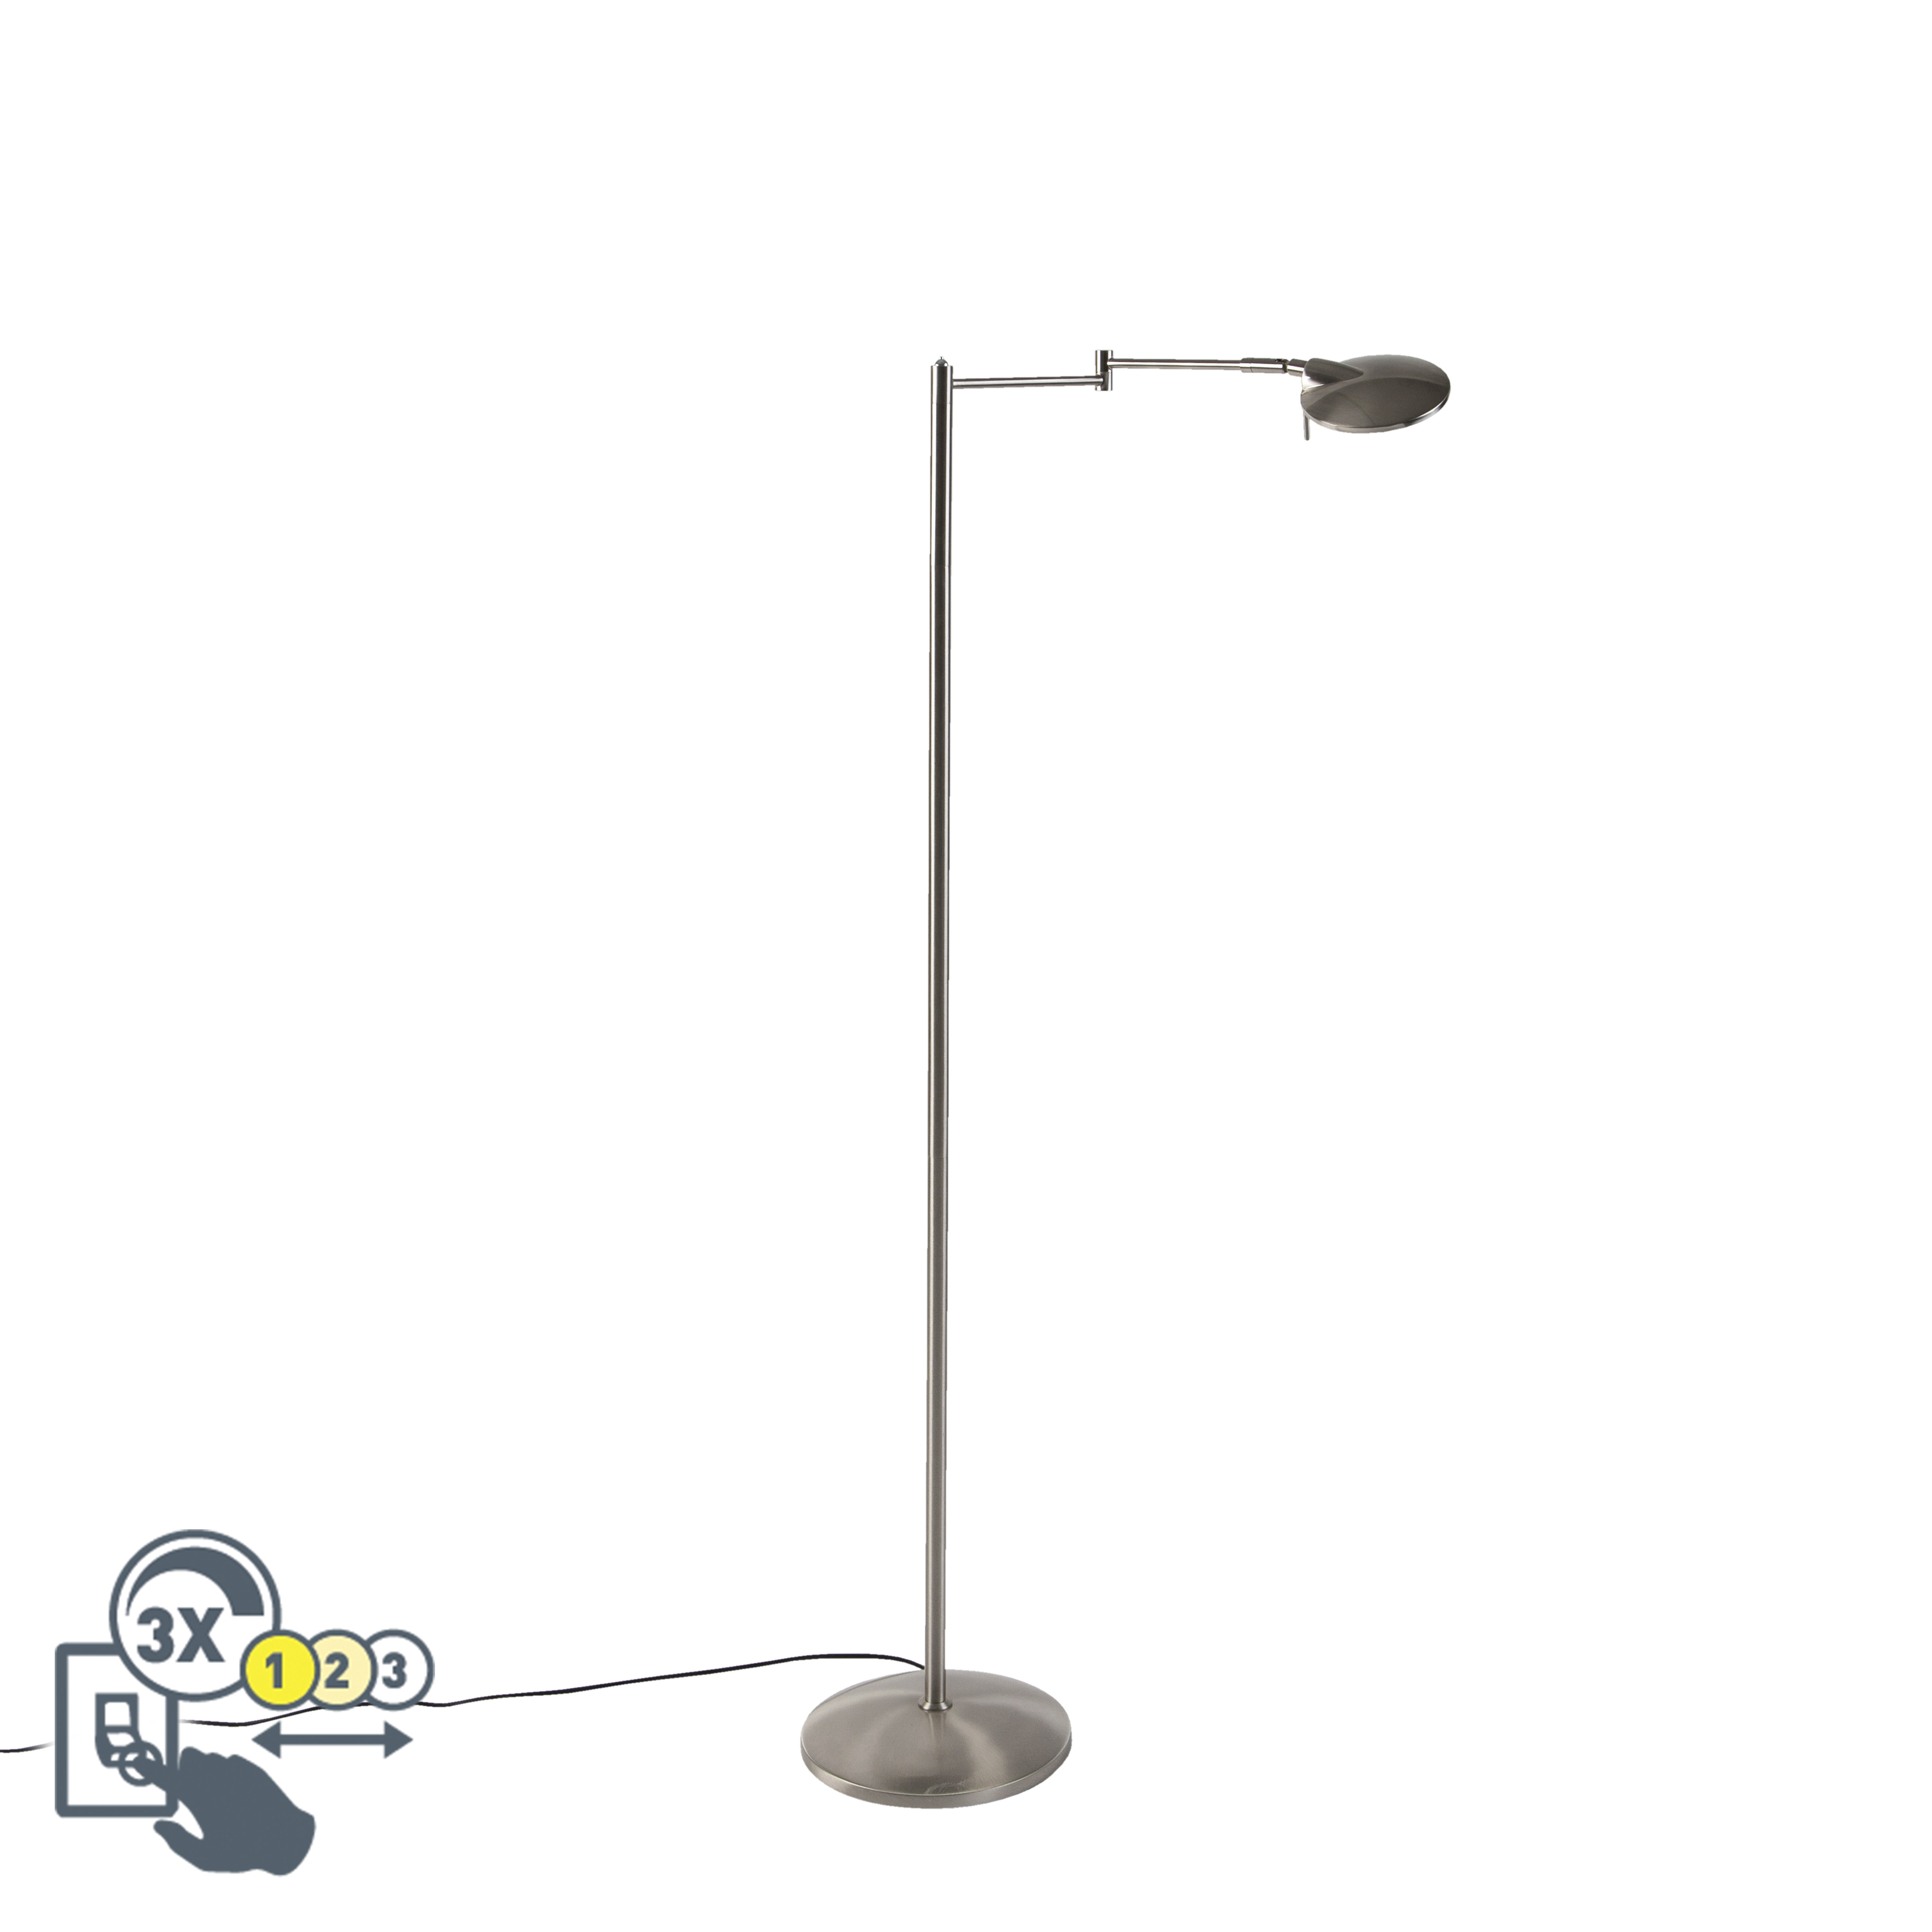 Moderne zwenkbare leeslamp staal incl. LED en dimmer - Kazam